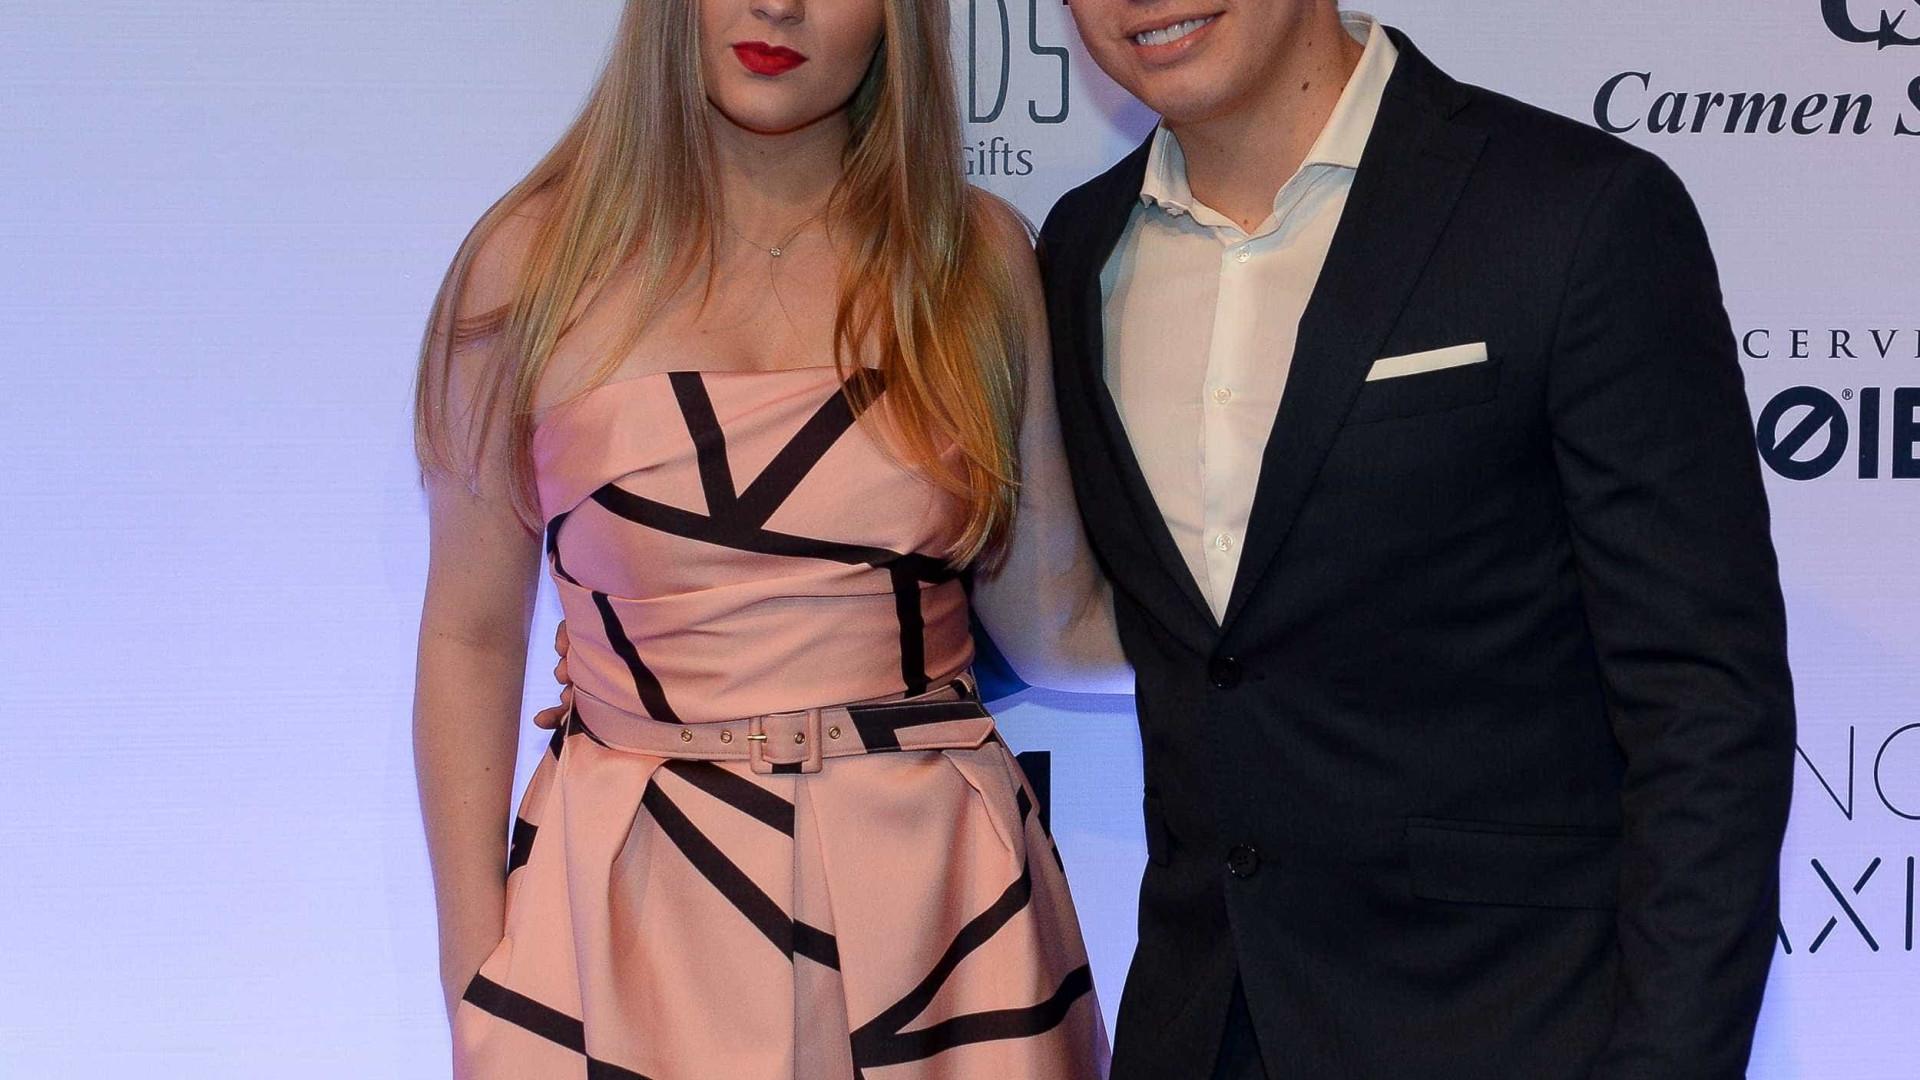 Whindersson se pronuncia sobre vazamento de nude de Luísa Sonza